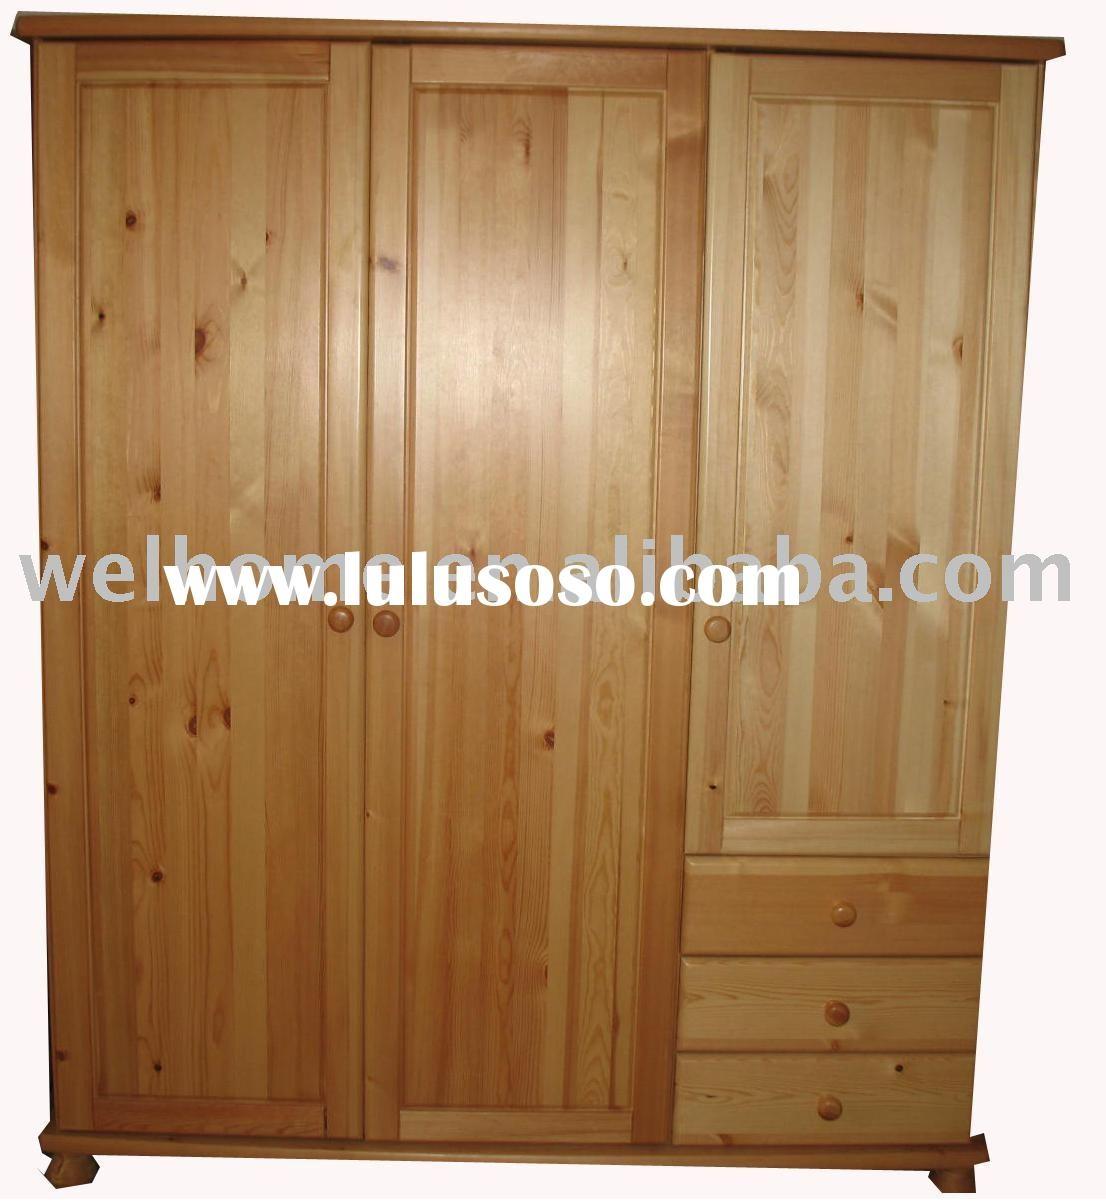 Furniture Fancy Wardrobe Armoire For Wardrobe Organizer Idea Throughout Solid Wood Wardrobe Closets (View 19 of 25)